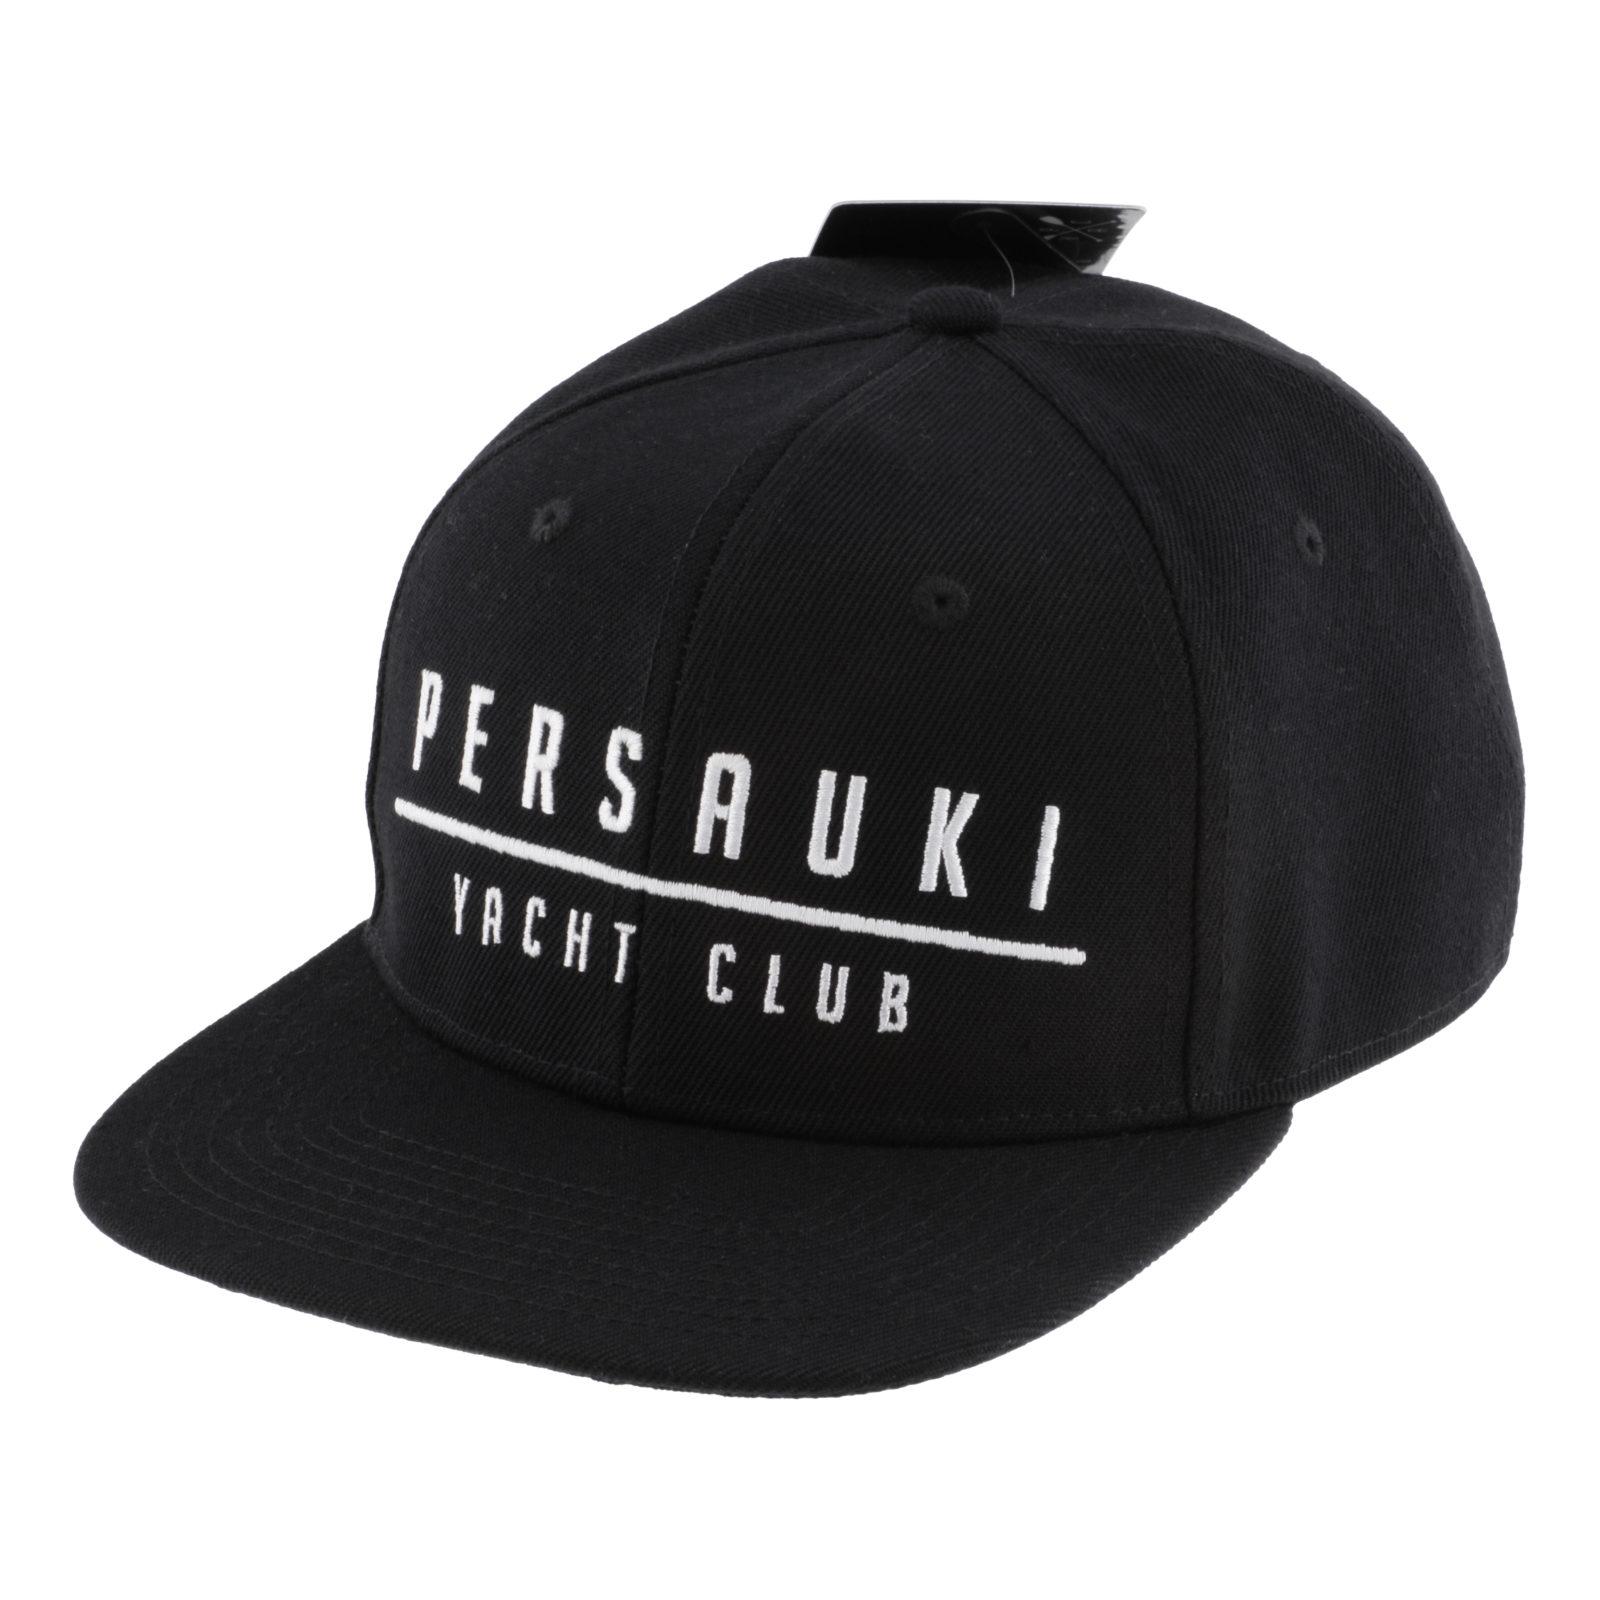 Tuotekuva: Persauki Yacht Club – Musta Snapback lippis